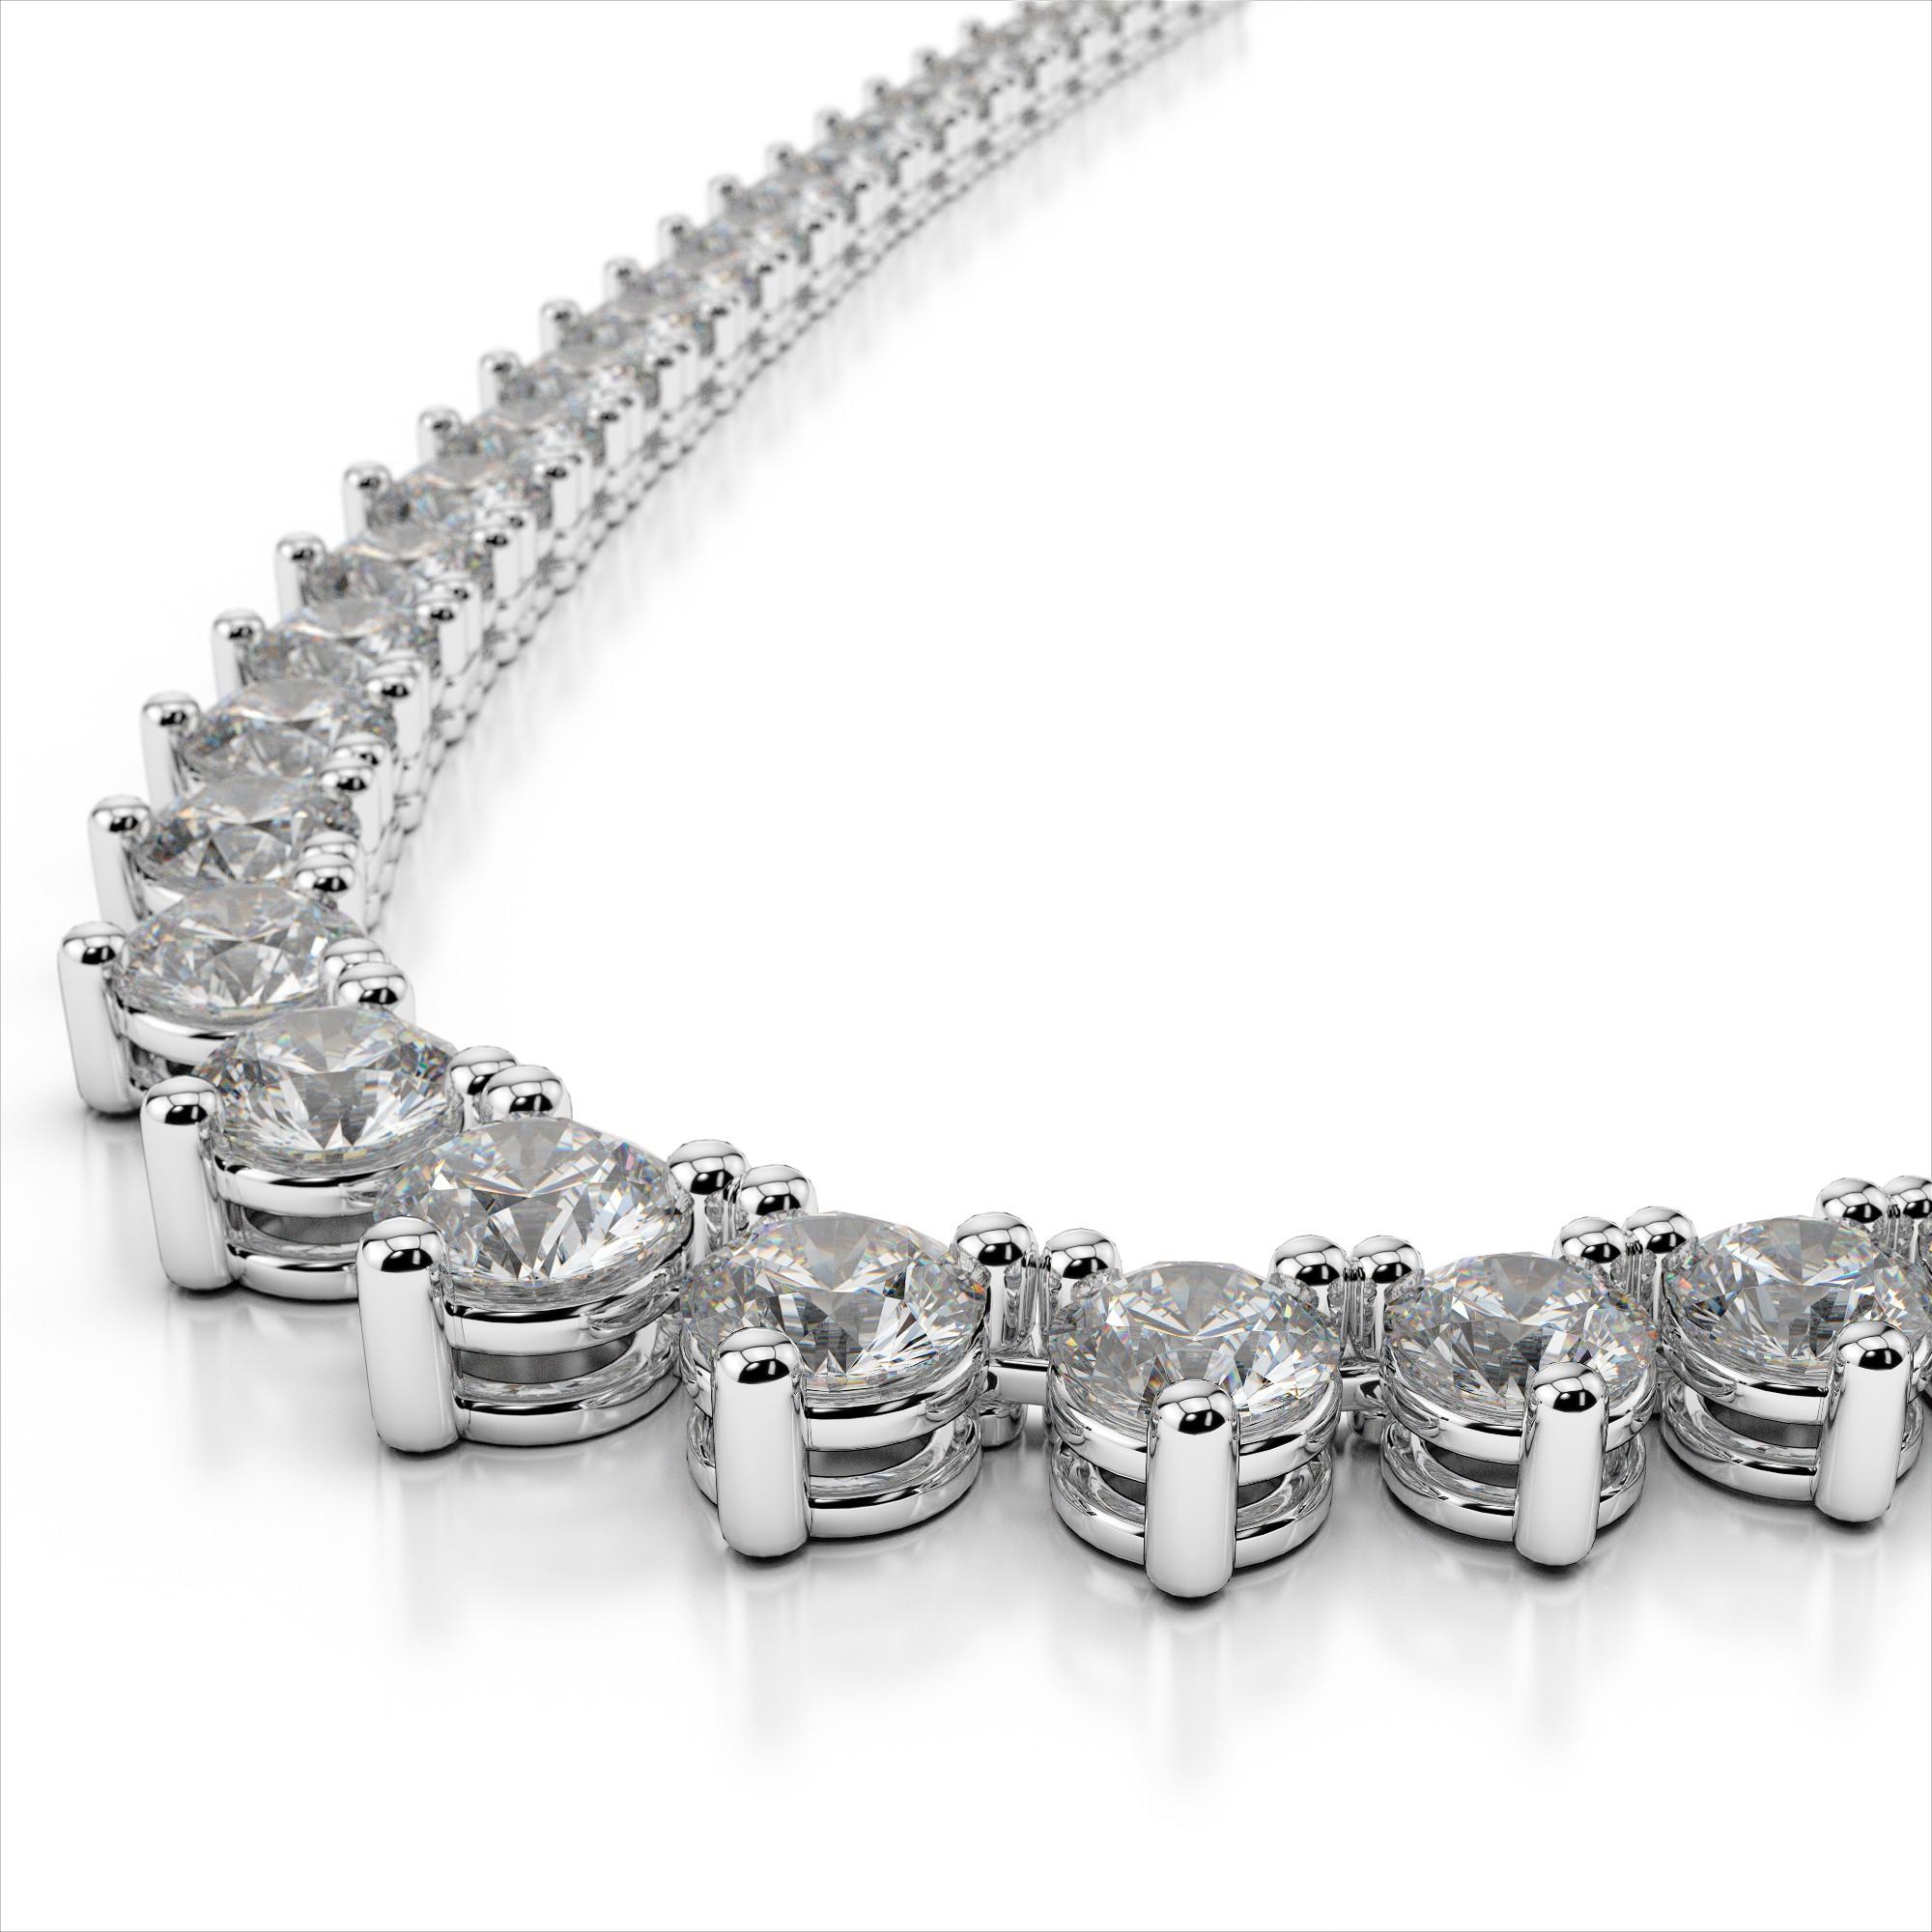 7861e61b38ac4b 3 Prong Tennis Necklace With Graduate Diamond Sizes - Sarkisians Jewelry